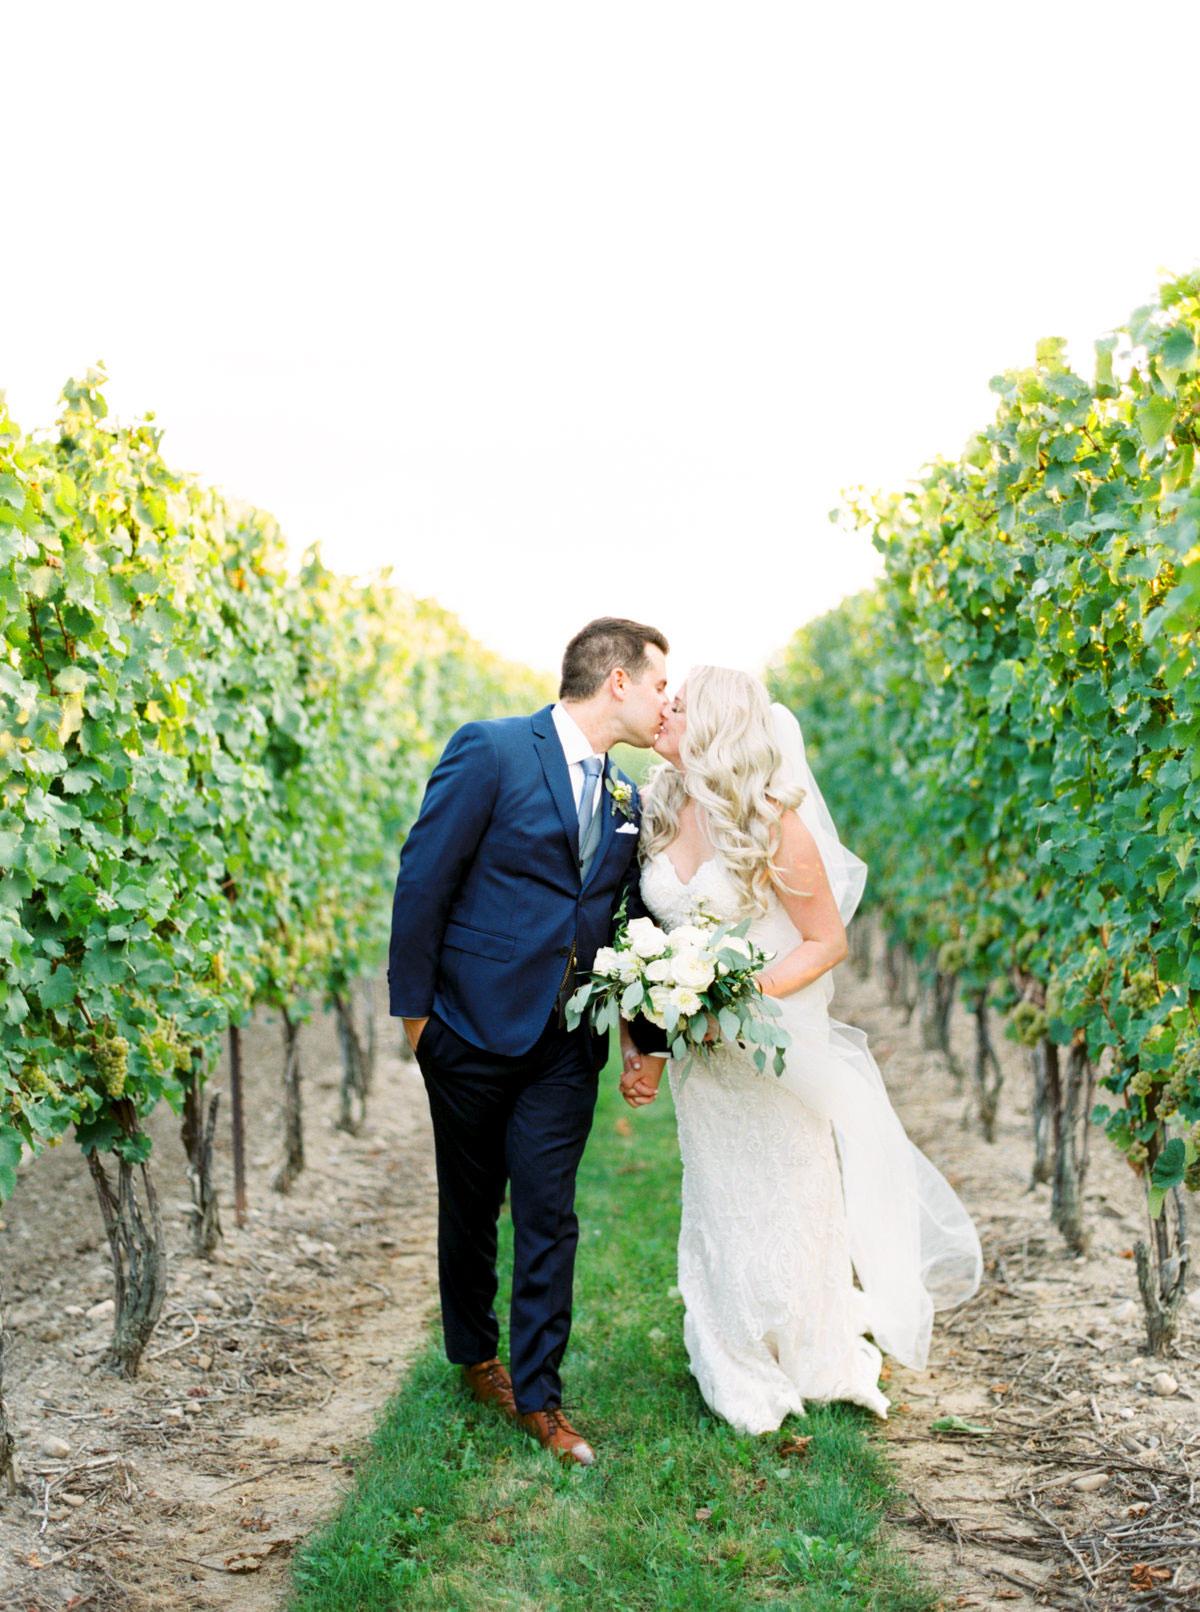 vineyard-bride-kayla-yestal-outdoor-summer-wedding-honsberger-estate-winery-niagara-toronto-vendor-0037.jpg